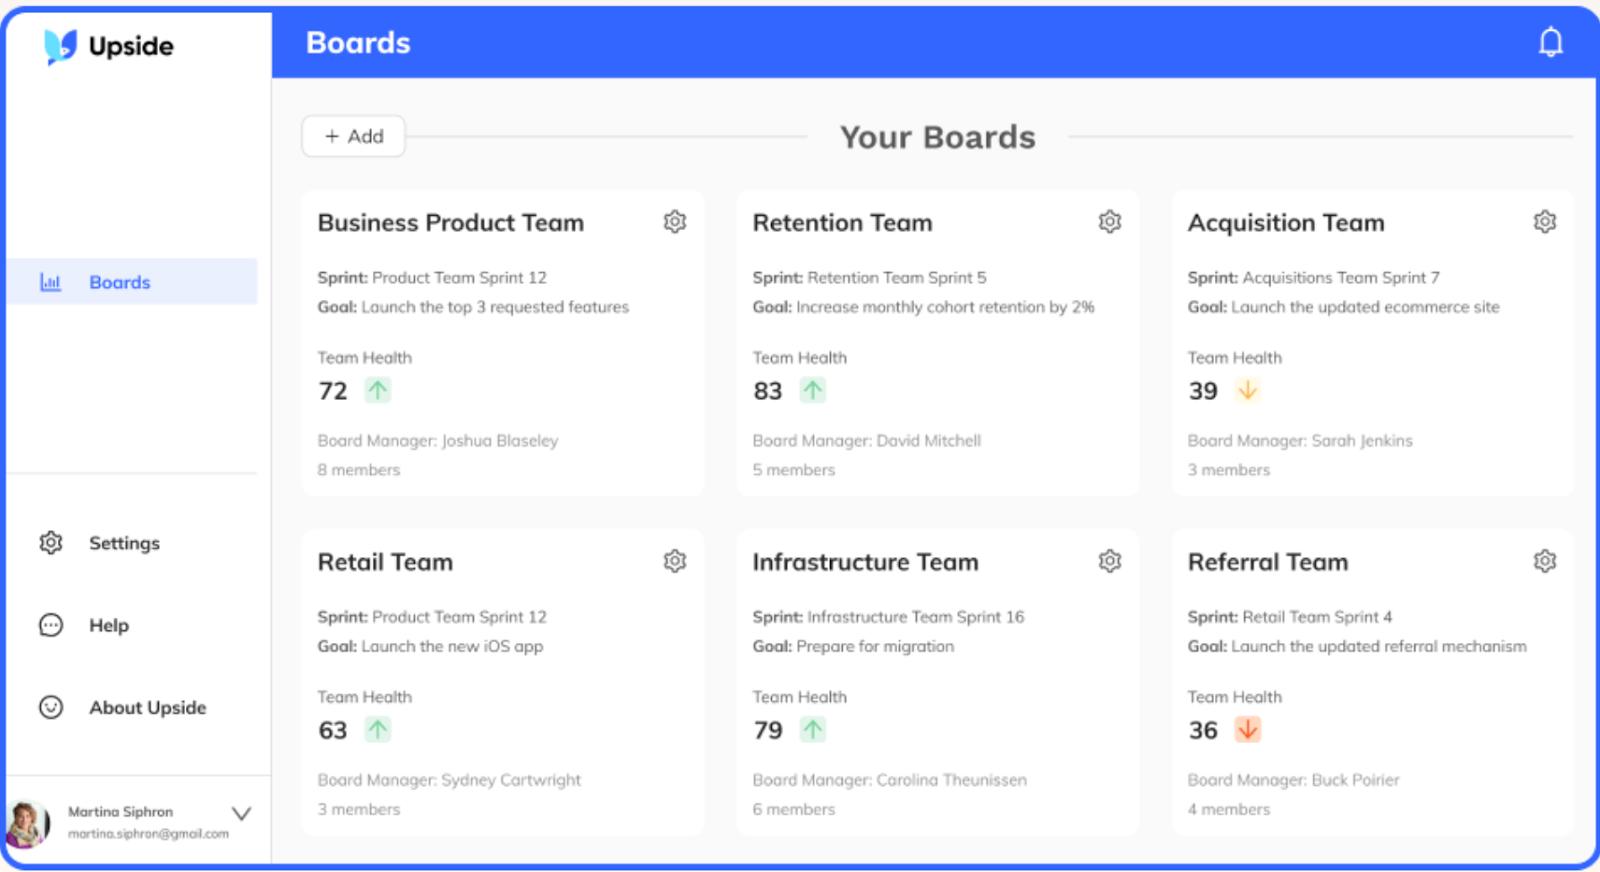 Screenshot of Boards page of the Upside analytics platform